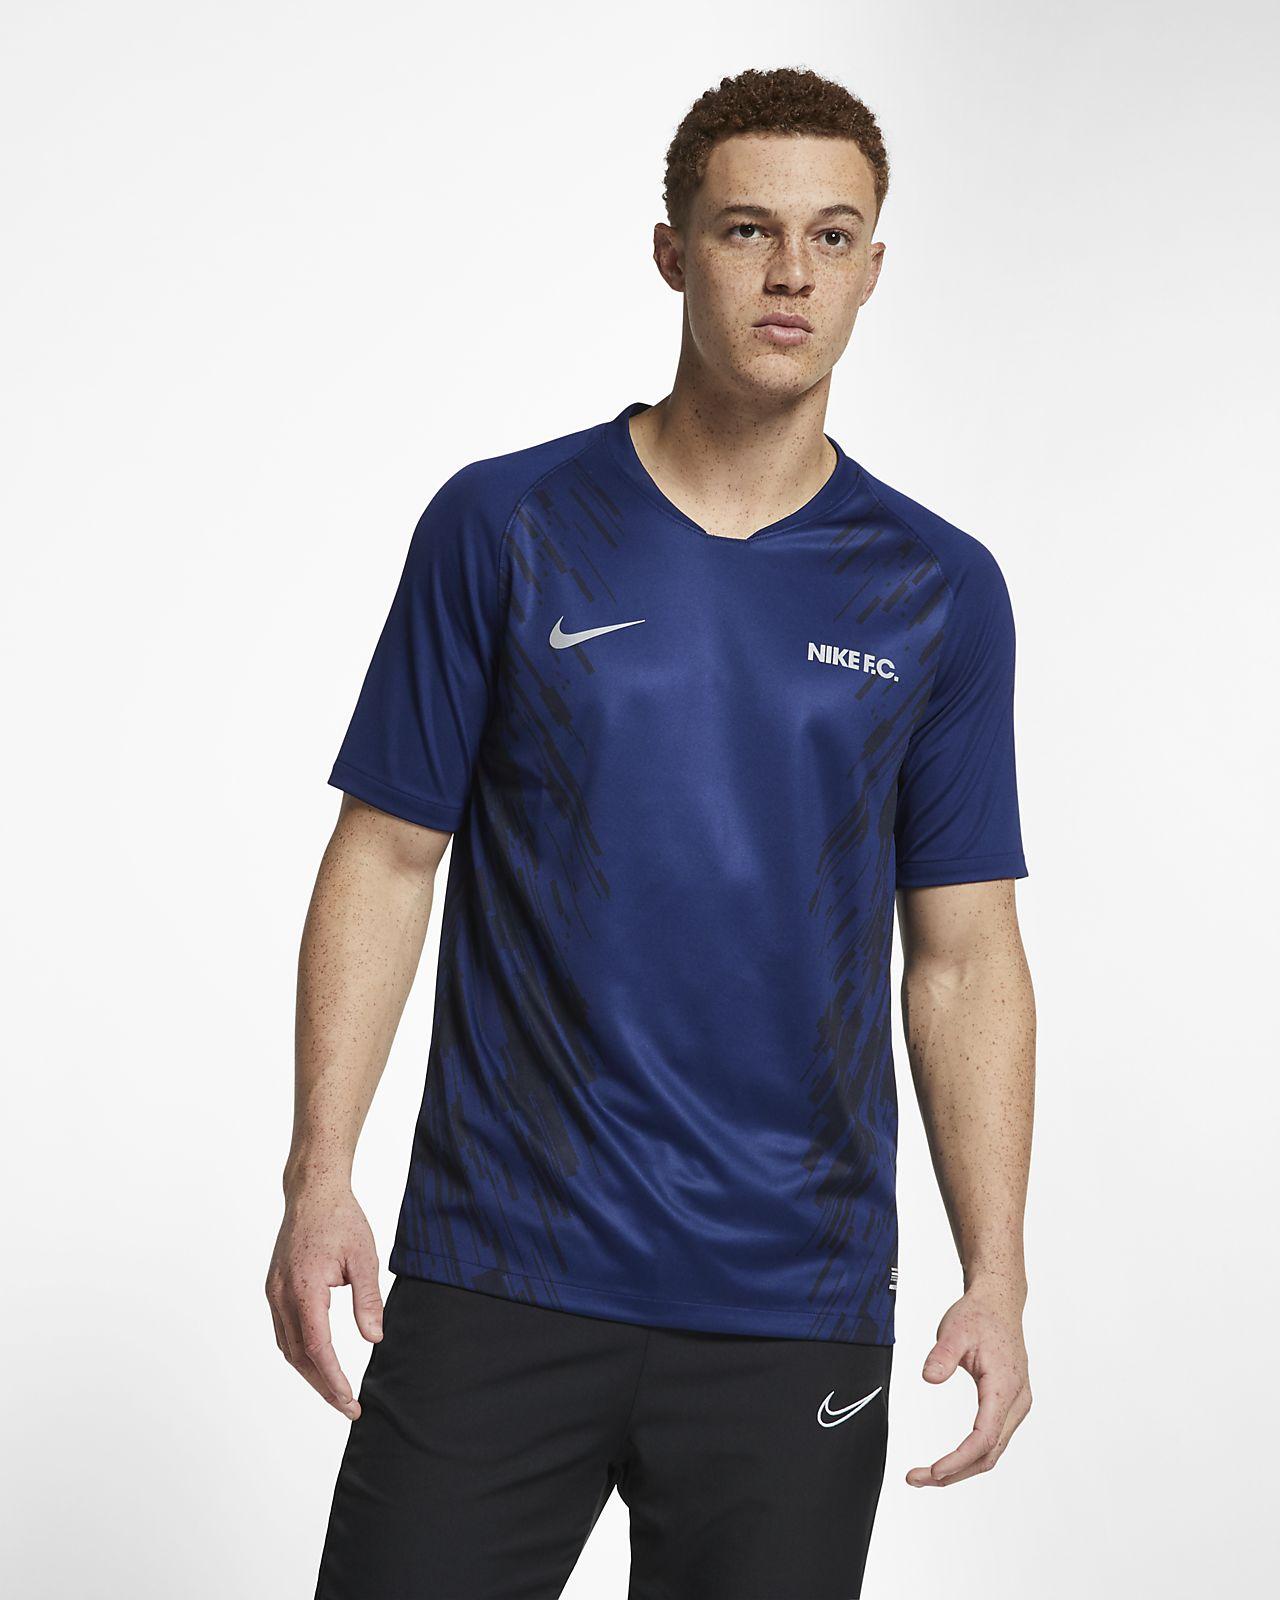 Nike F.C. Men's Football Shirt